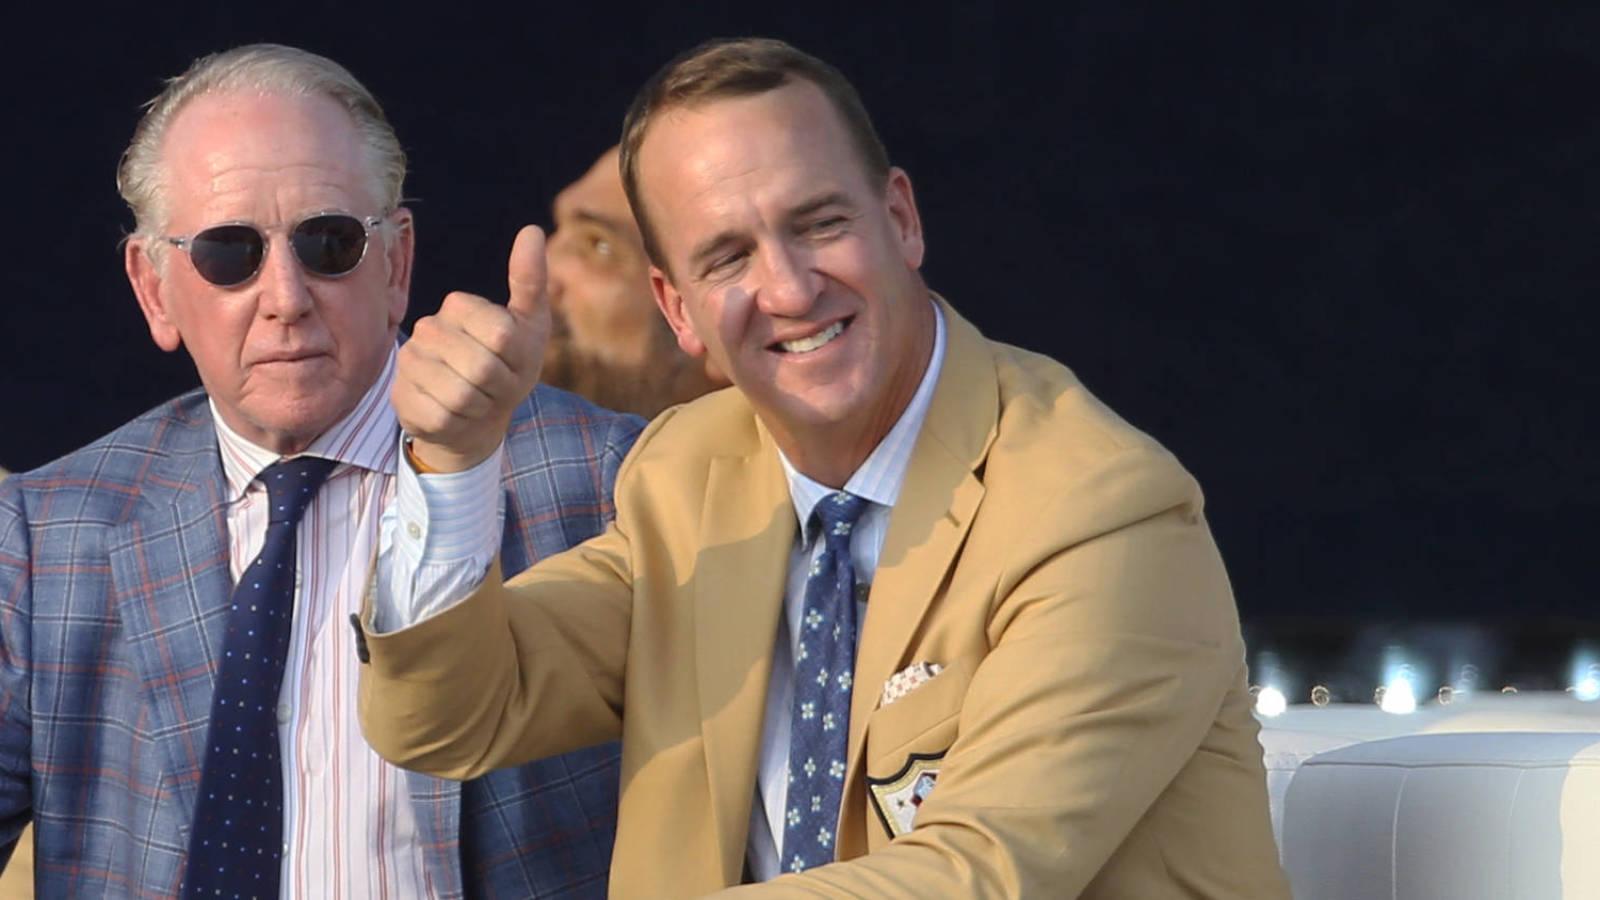 Peyton's got a great Ray Lewis, Tom Brady jokes during HOF speech